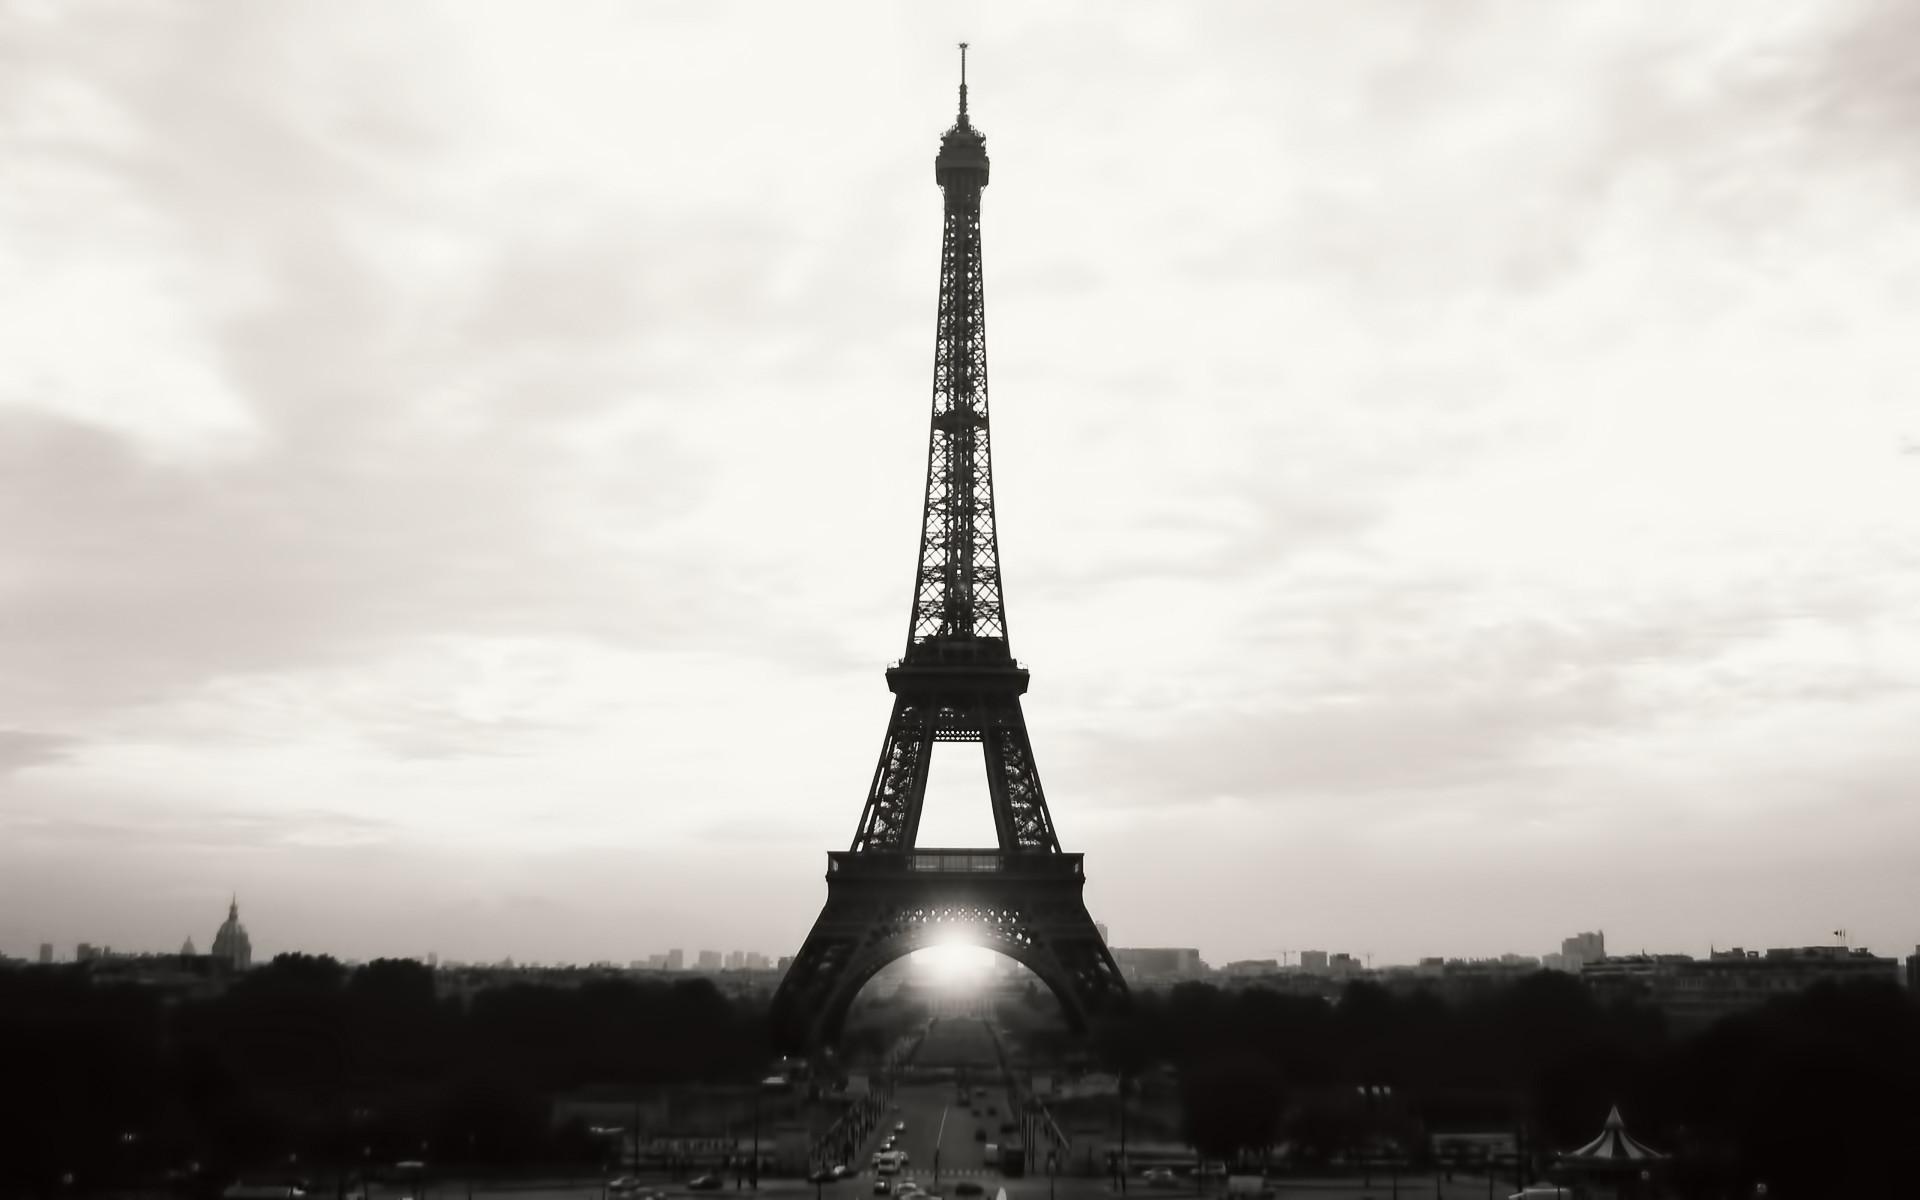 1920x1200 Eiffel Tower Paris Black And White Photography Desktop Wallpaper